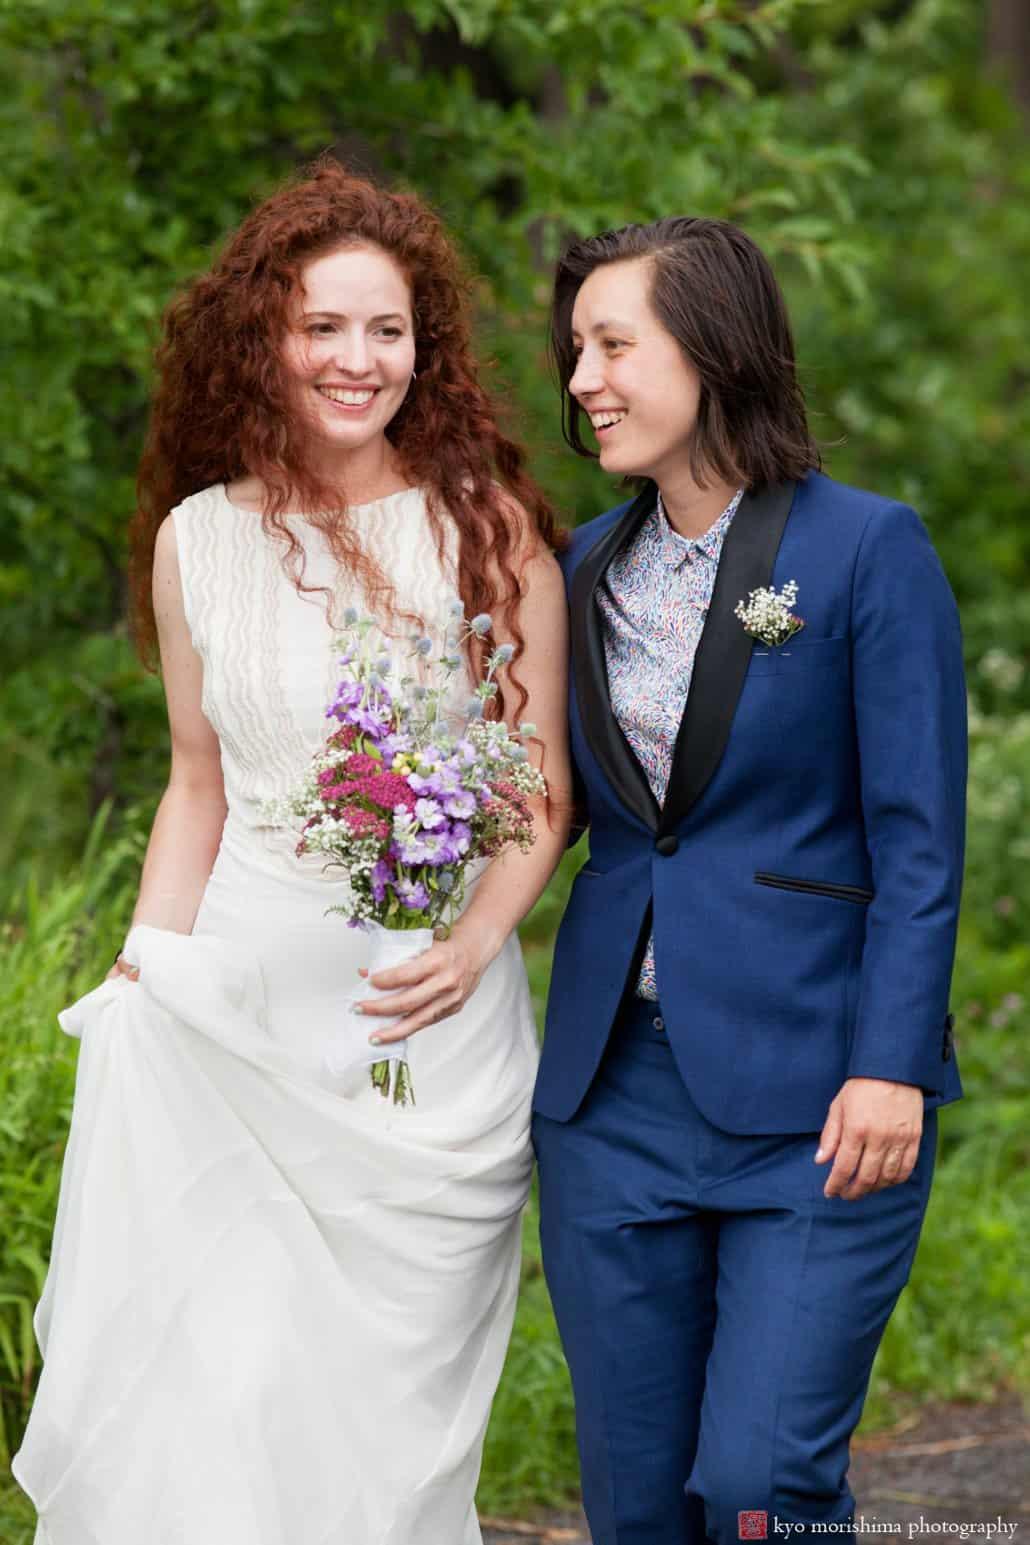 LGBT wedding portrait at Washington Avenue Pier in Philadelphia; bride wears Mara Hoffman wedding dresss and her partner wears Bindle and Keep custom suit; photographed by Kyo Morishima